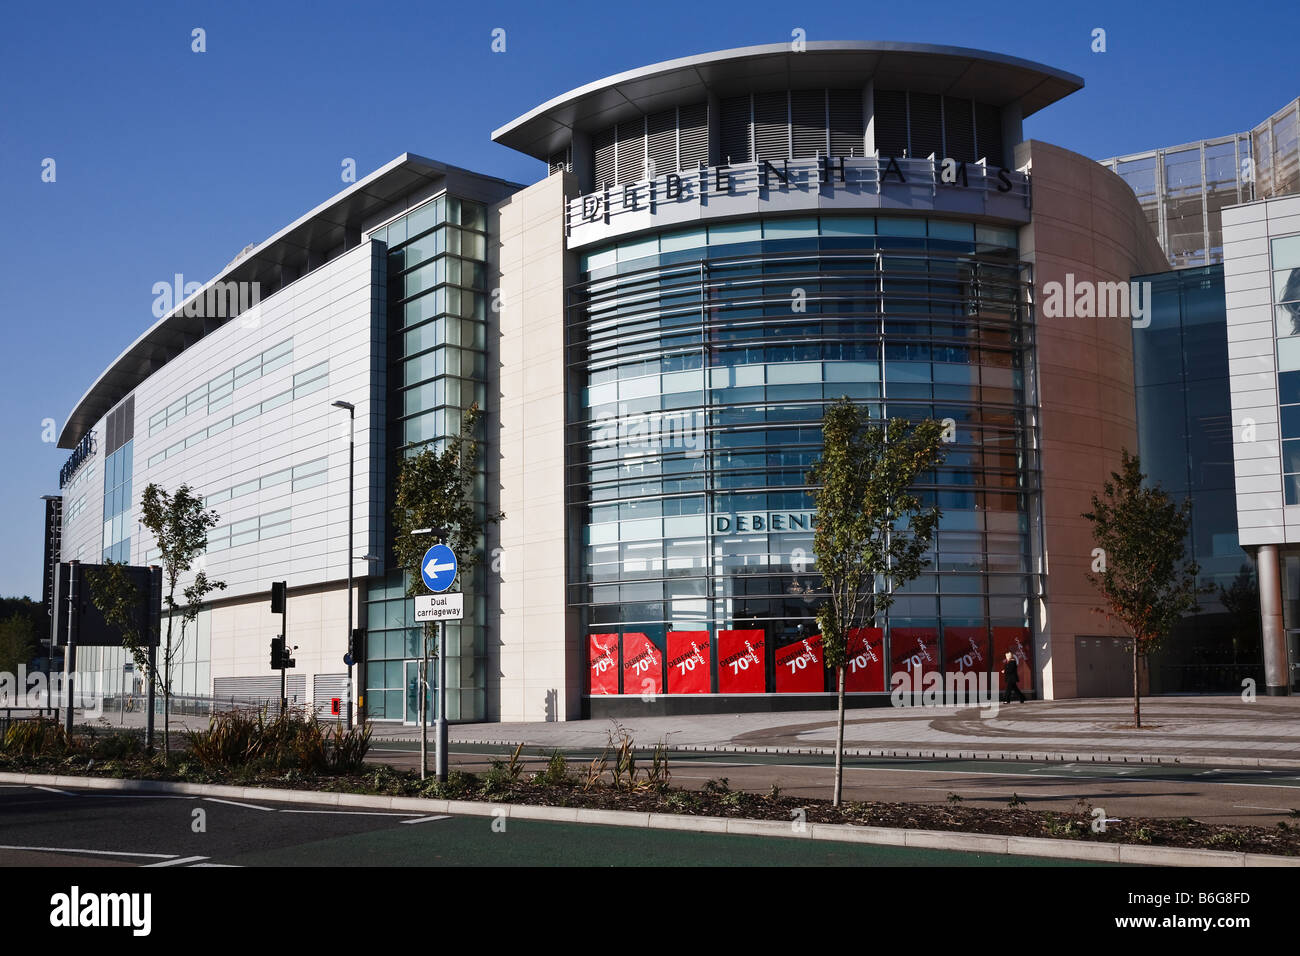 Westfield Centre, Derby, Derbyshire, England, UK - Stock Image